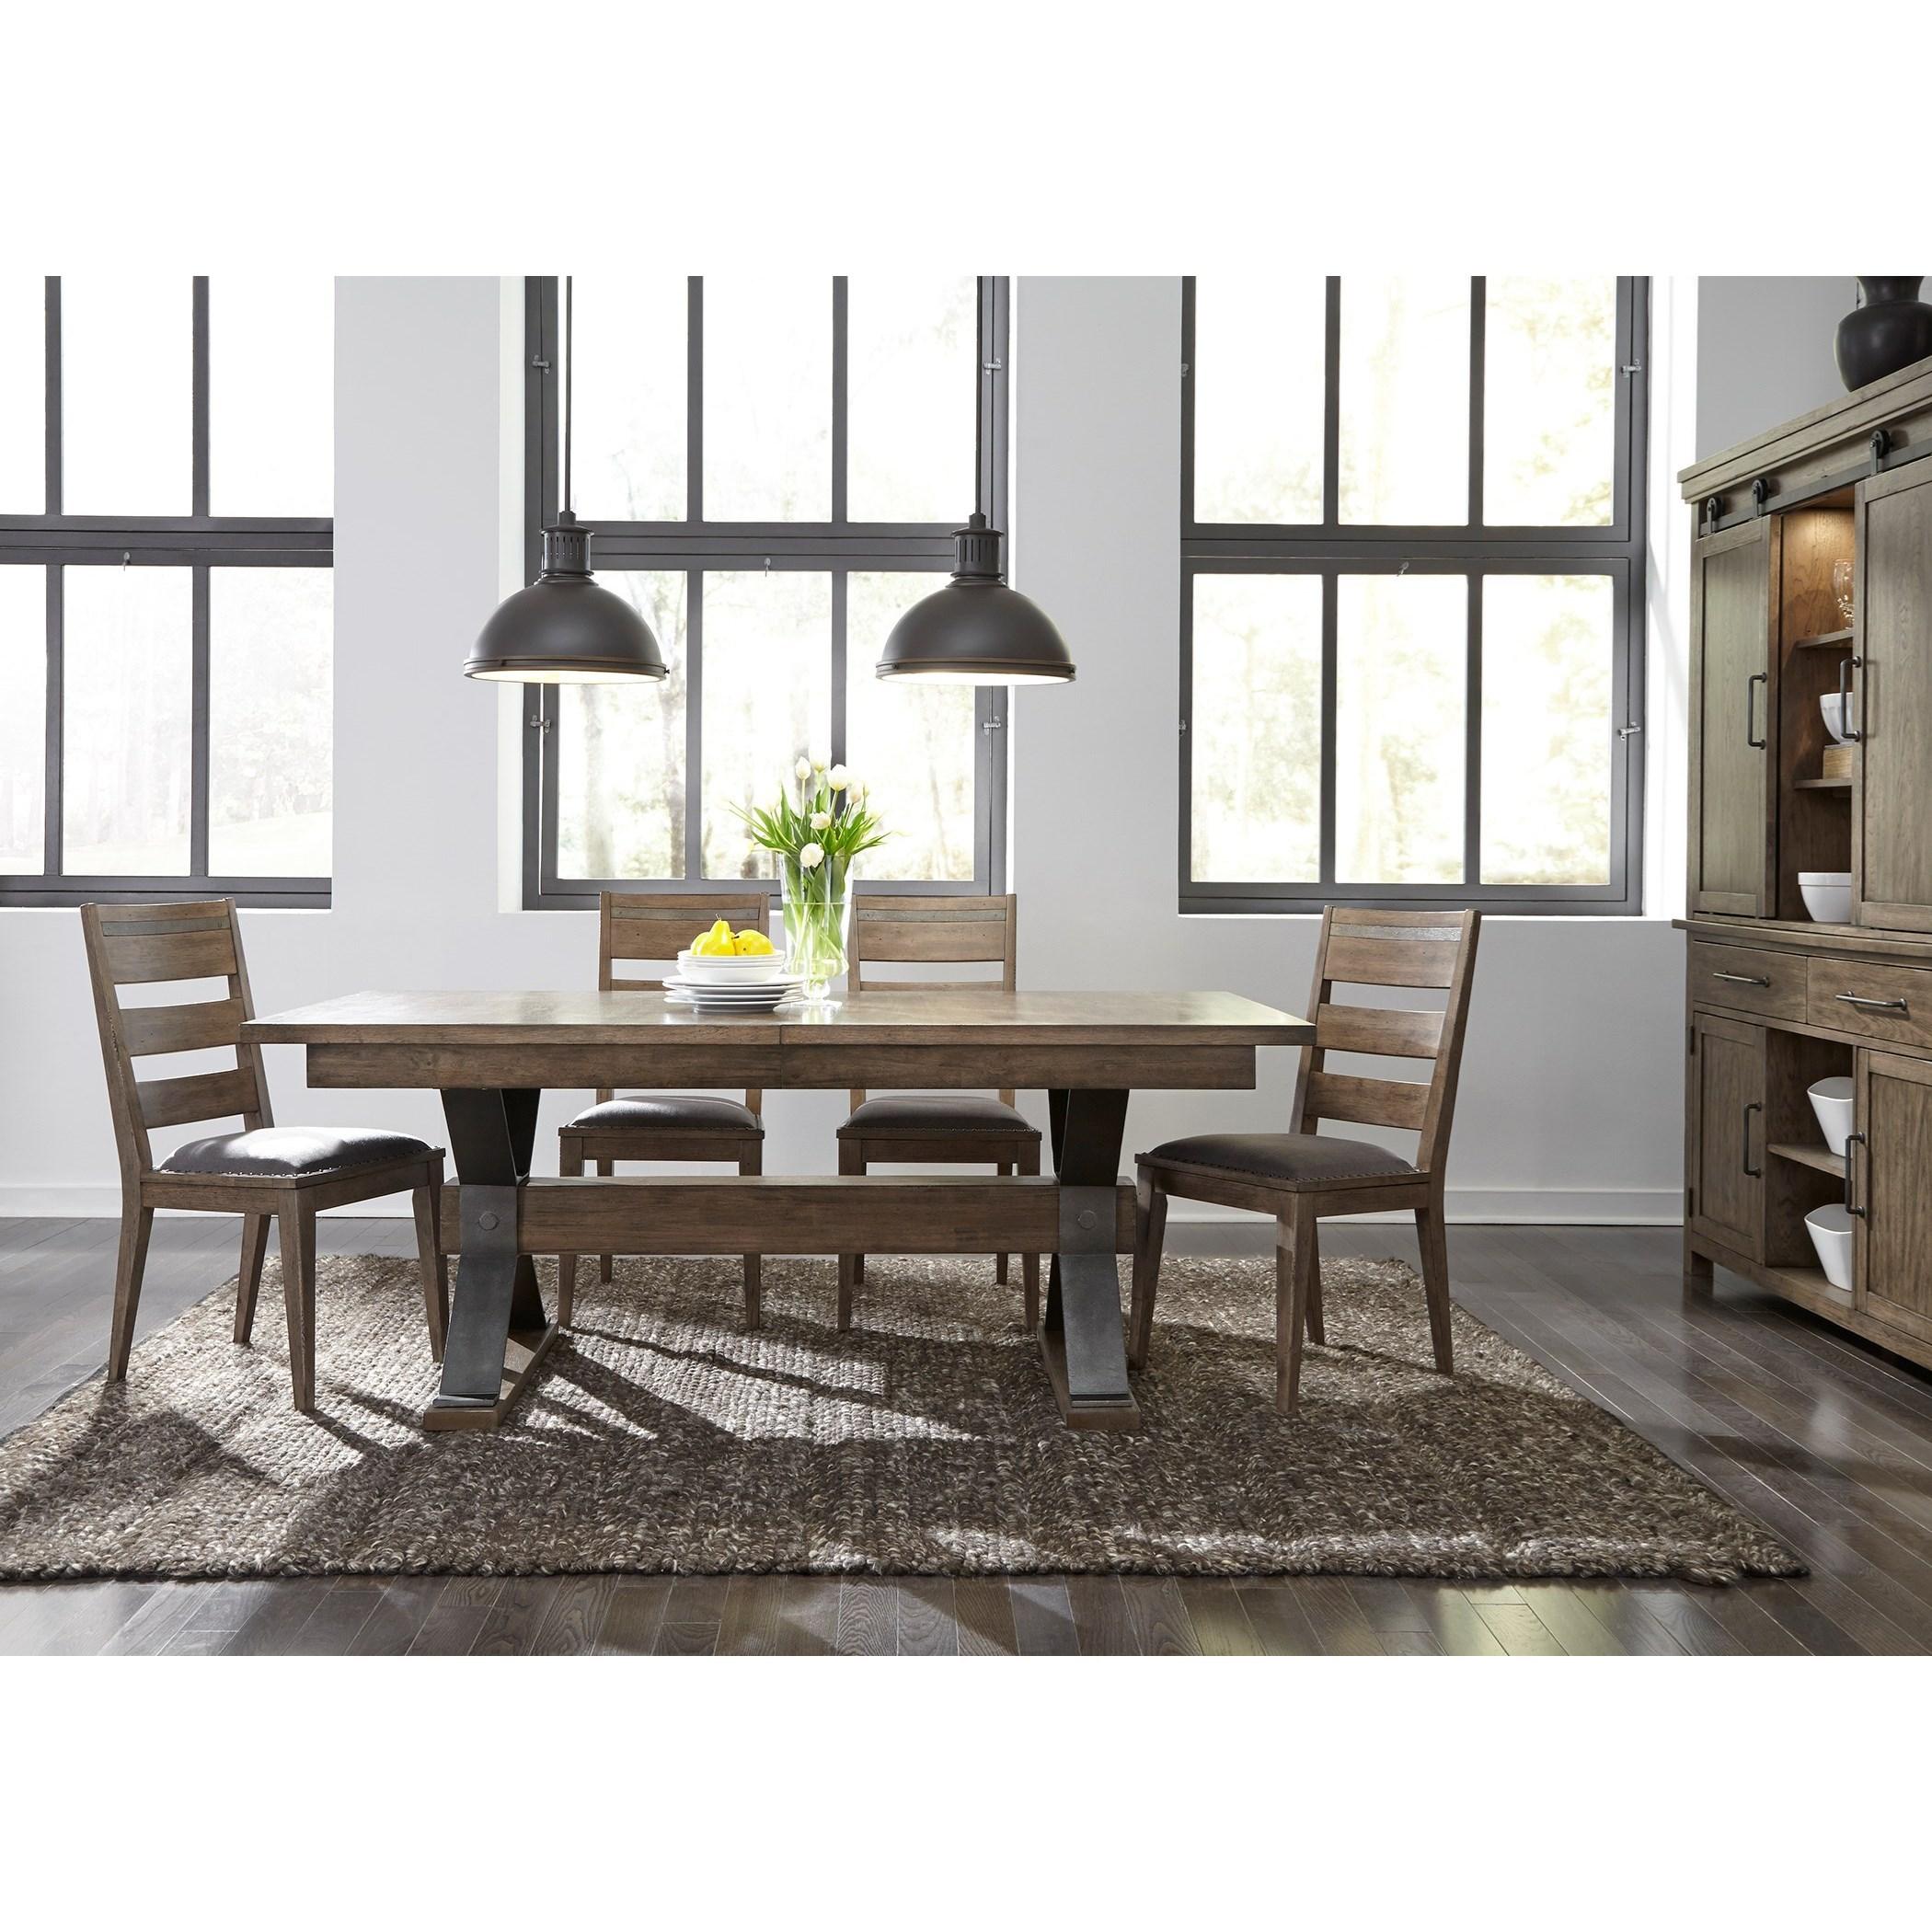 Sonoma Road Formal Dining Room Group by Sarah Randolph Designs at Virginia Furniture Market